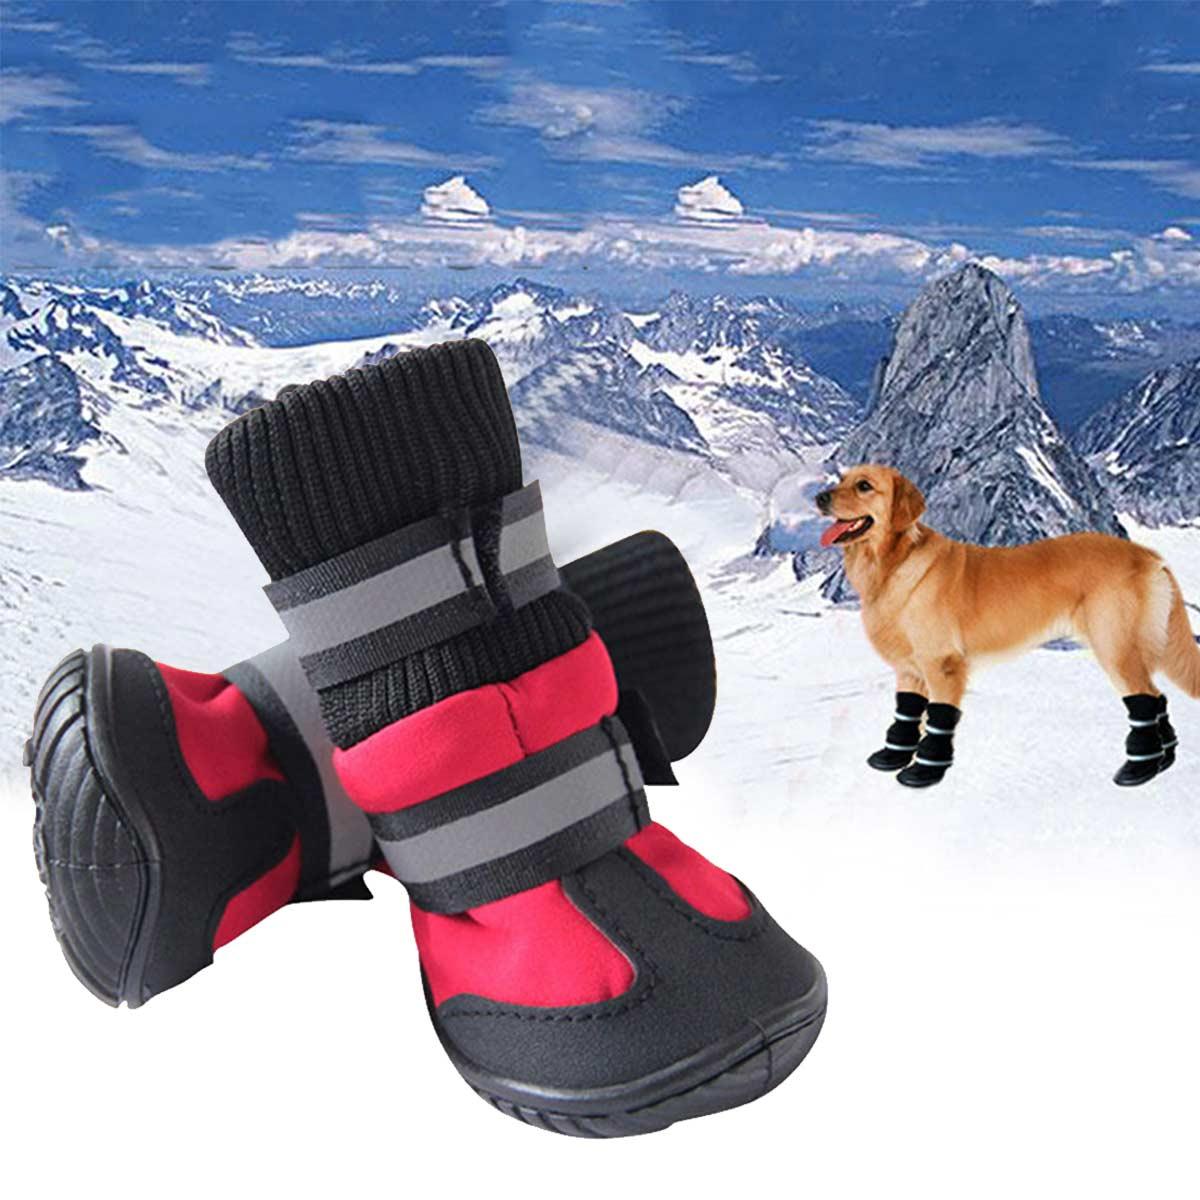 4/Pcs Dog Shoes High Waist Golden Retriever Samos Husky Waterproof Non-Slip Winter Dog Feet Large Dog Cotton Boots Pet Shoes